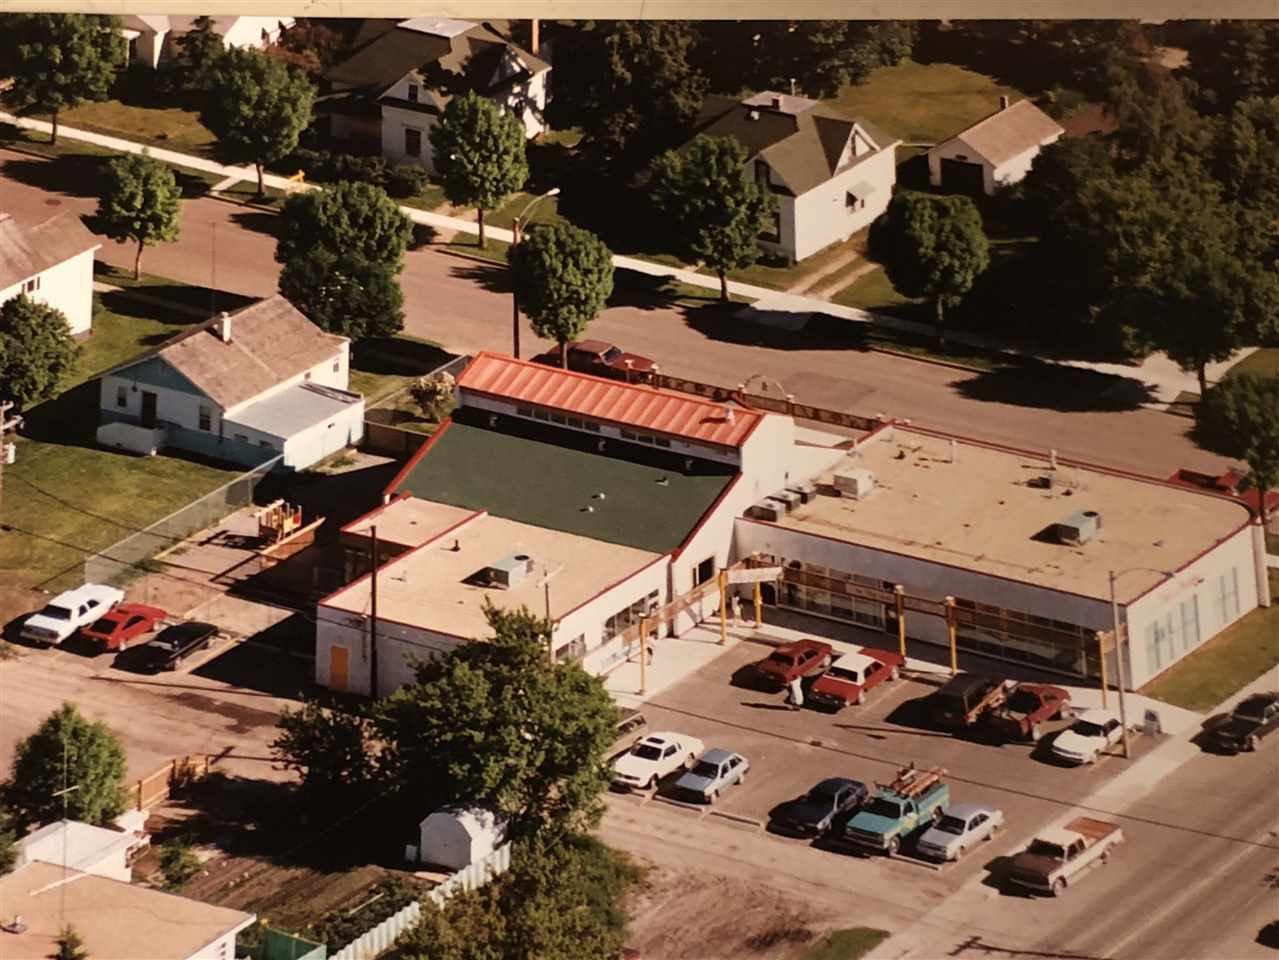 Main Photo: 5220 48 Avenue: Wetaskiwin Retail for sale : MLS®# E4218561